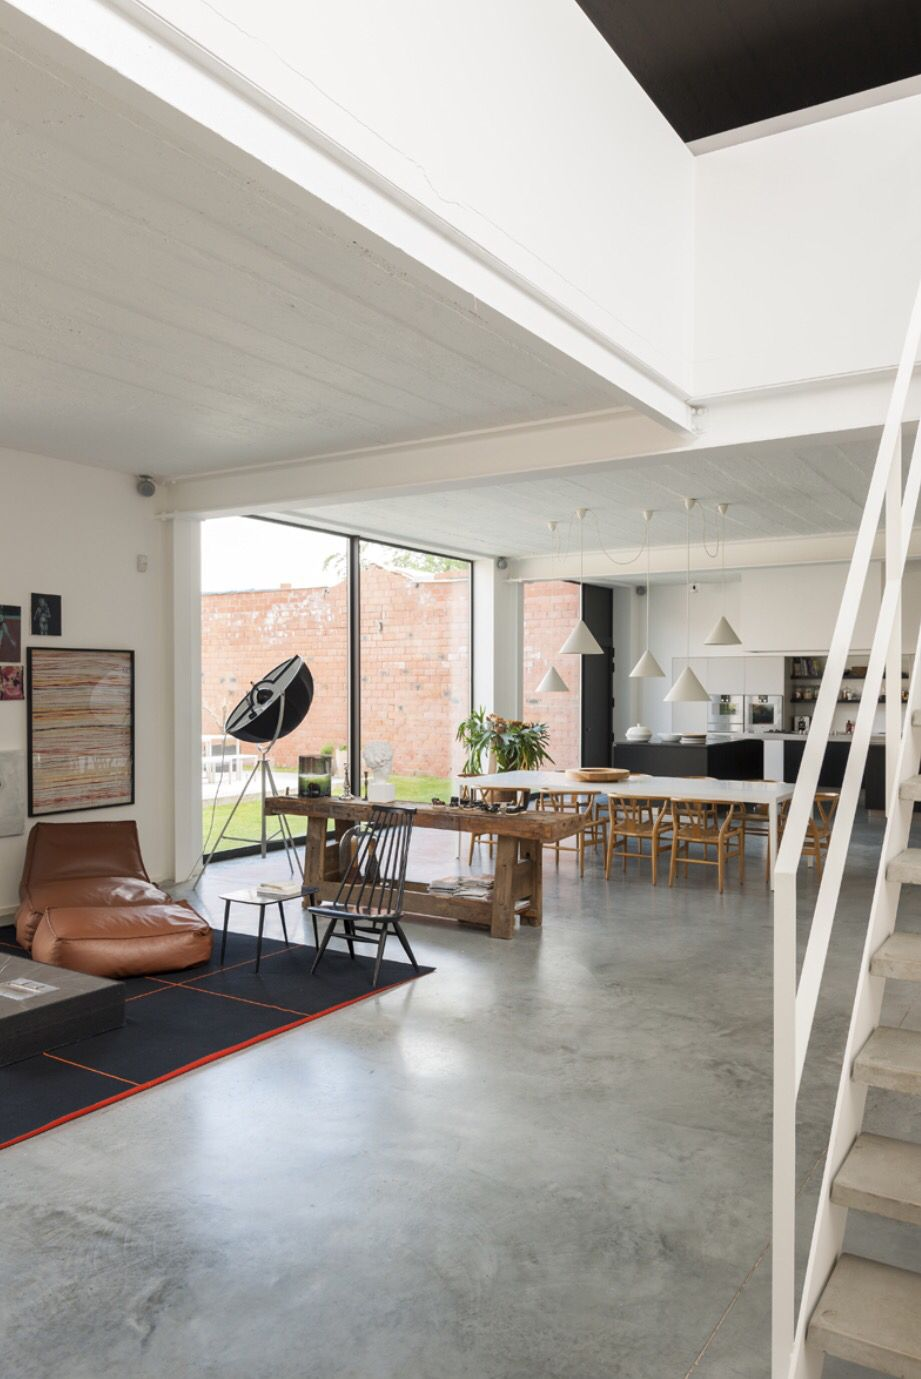 Kove interieurarchitecten Concrete floors living room